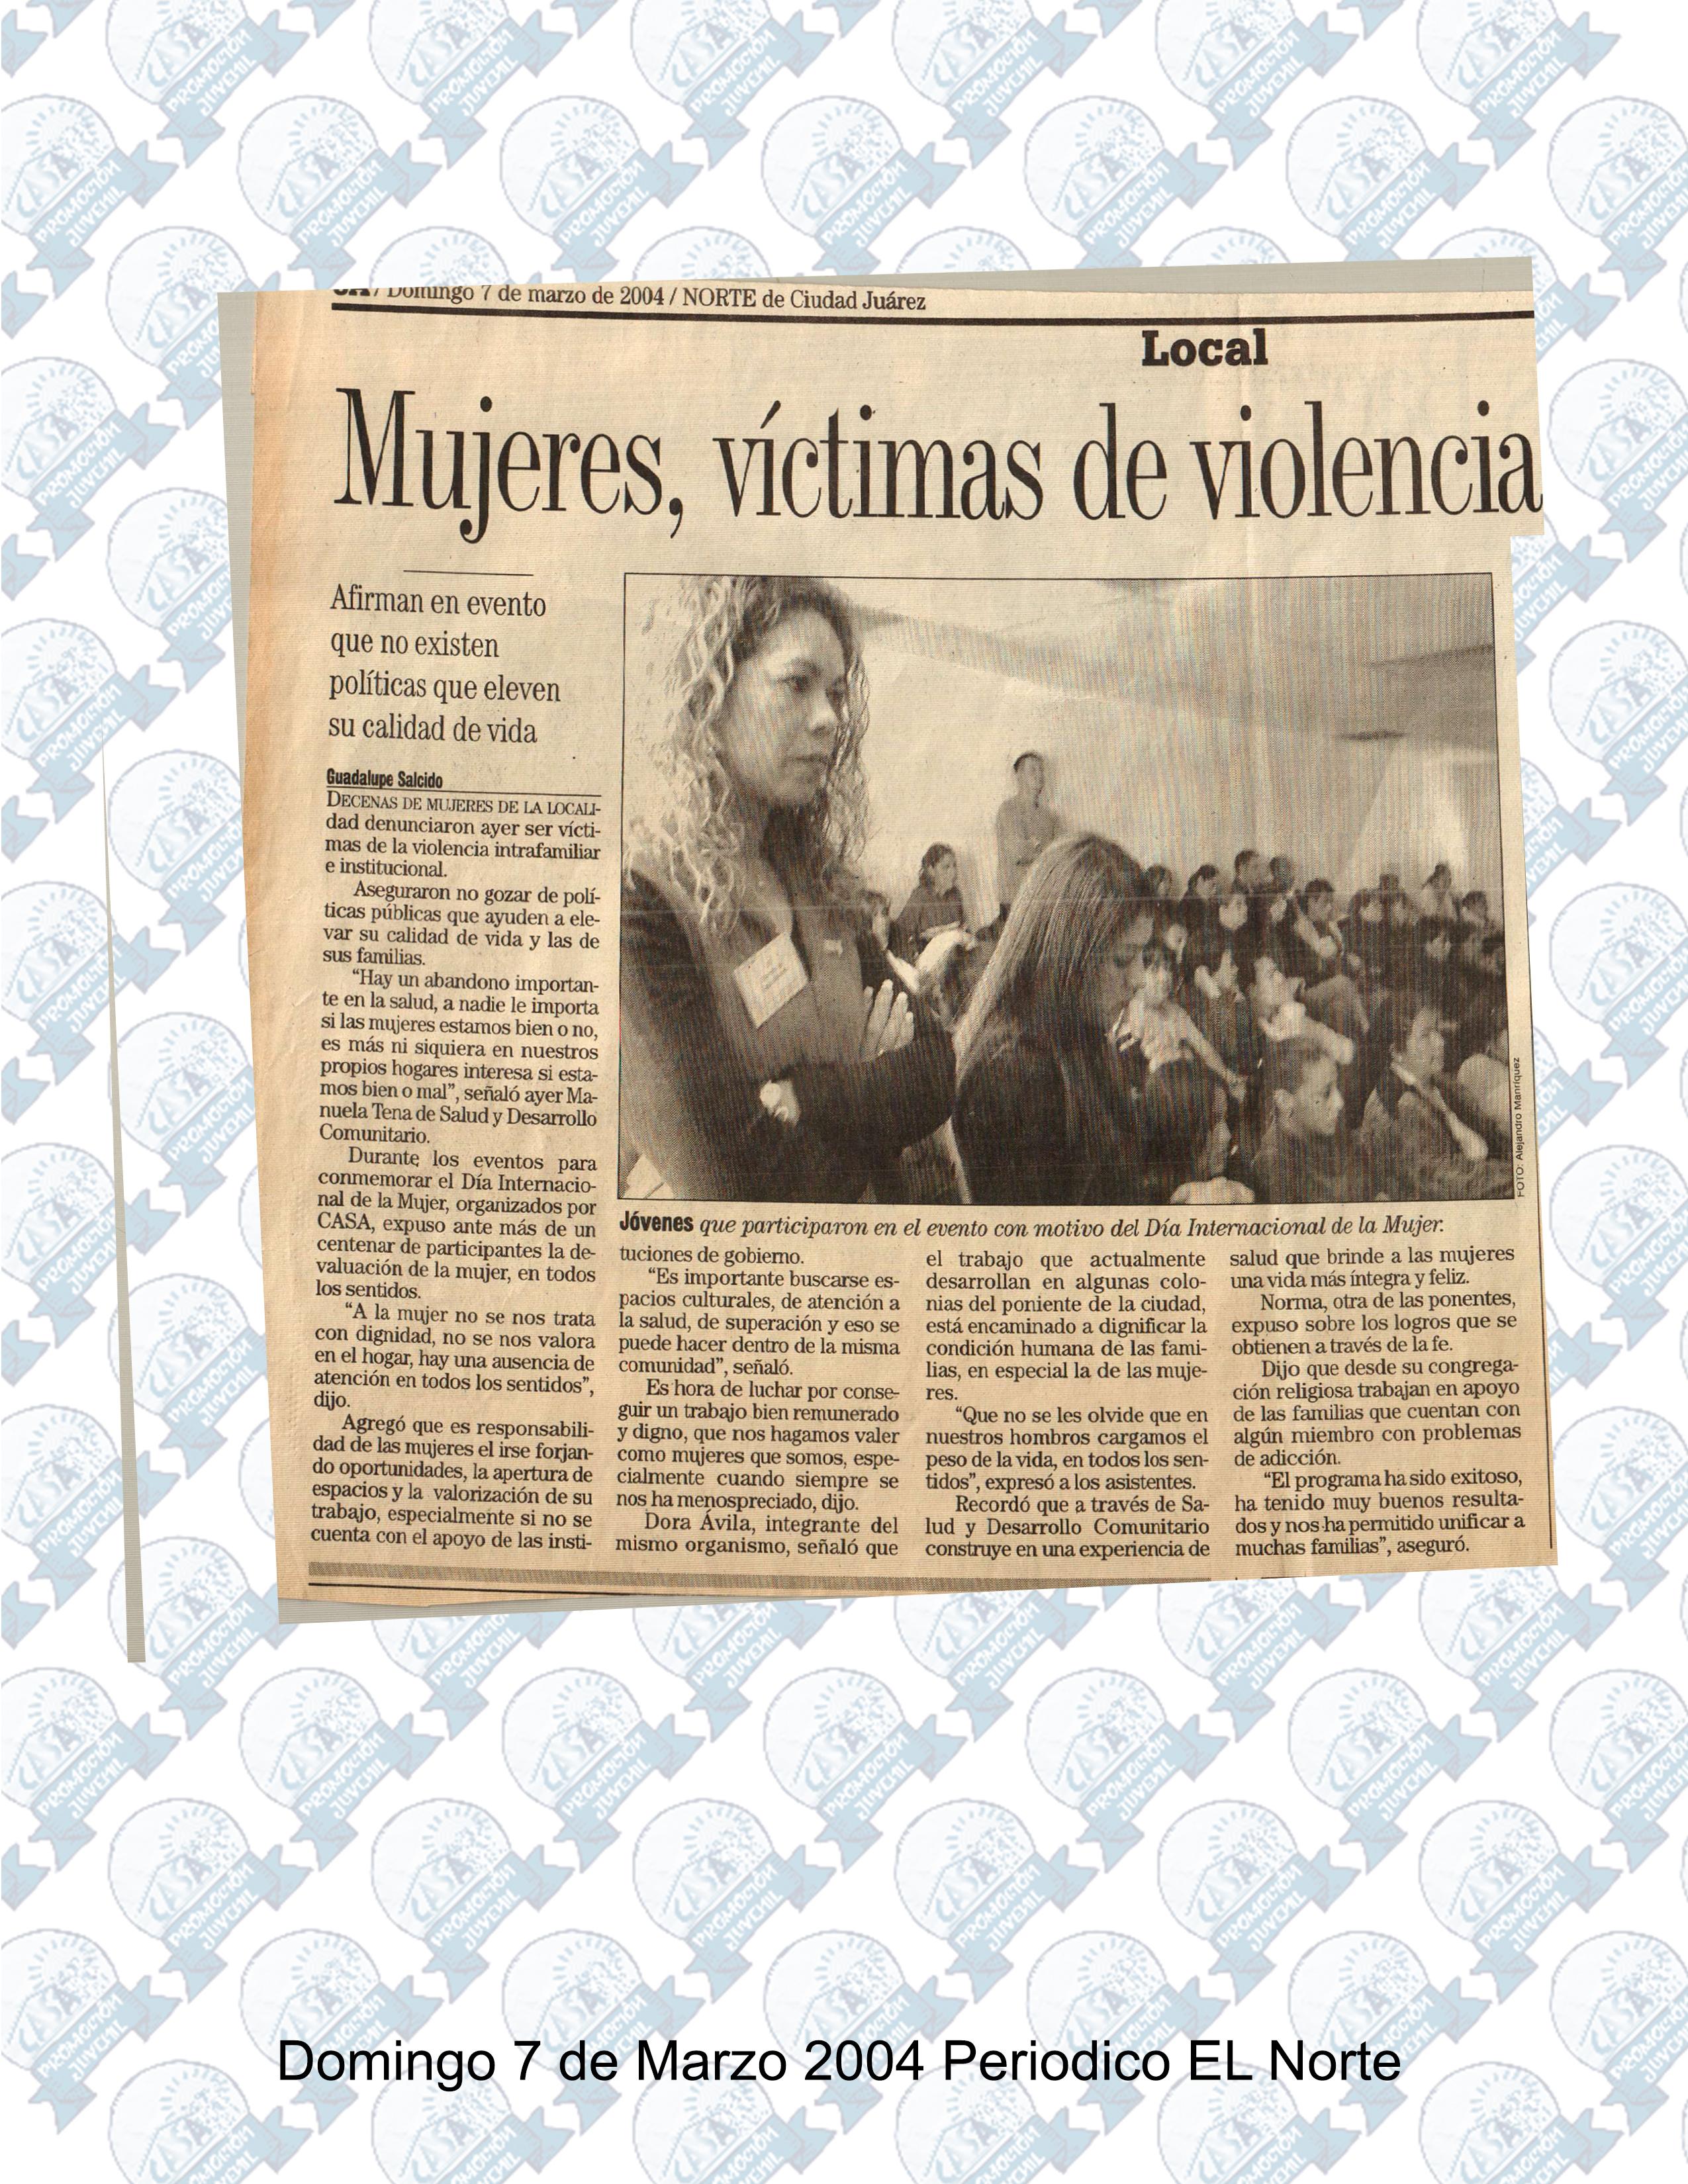 7 marzo 2004